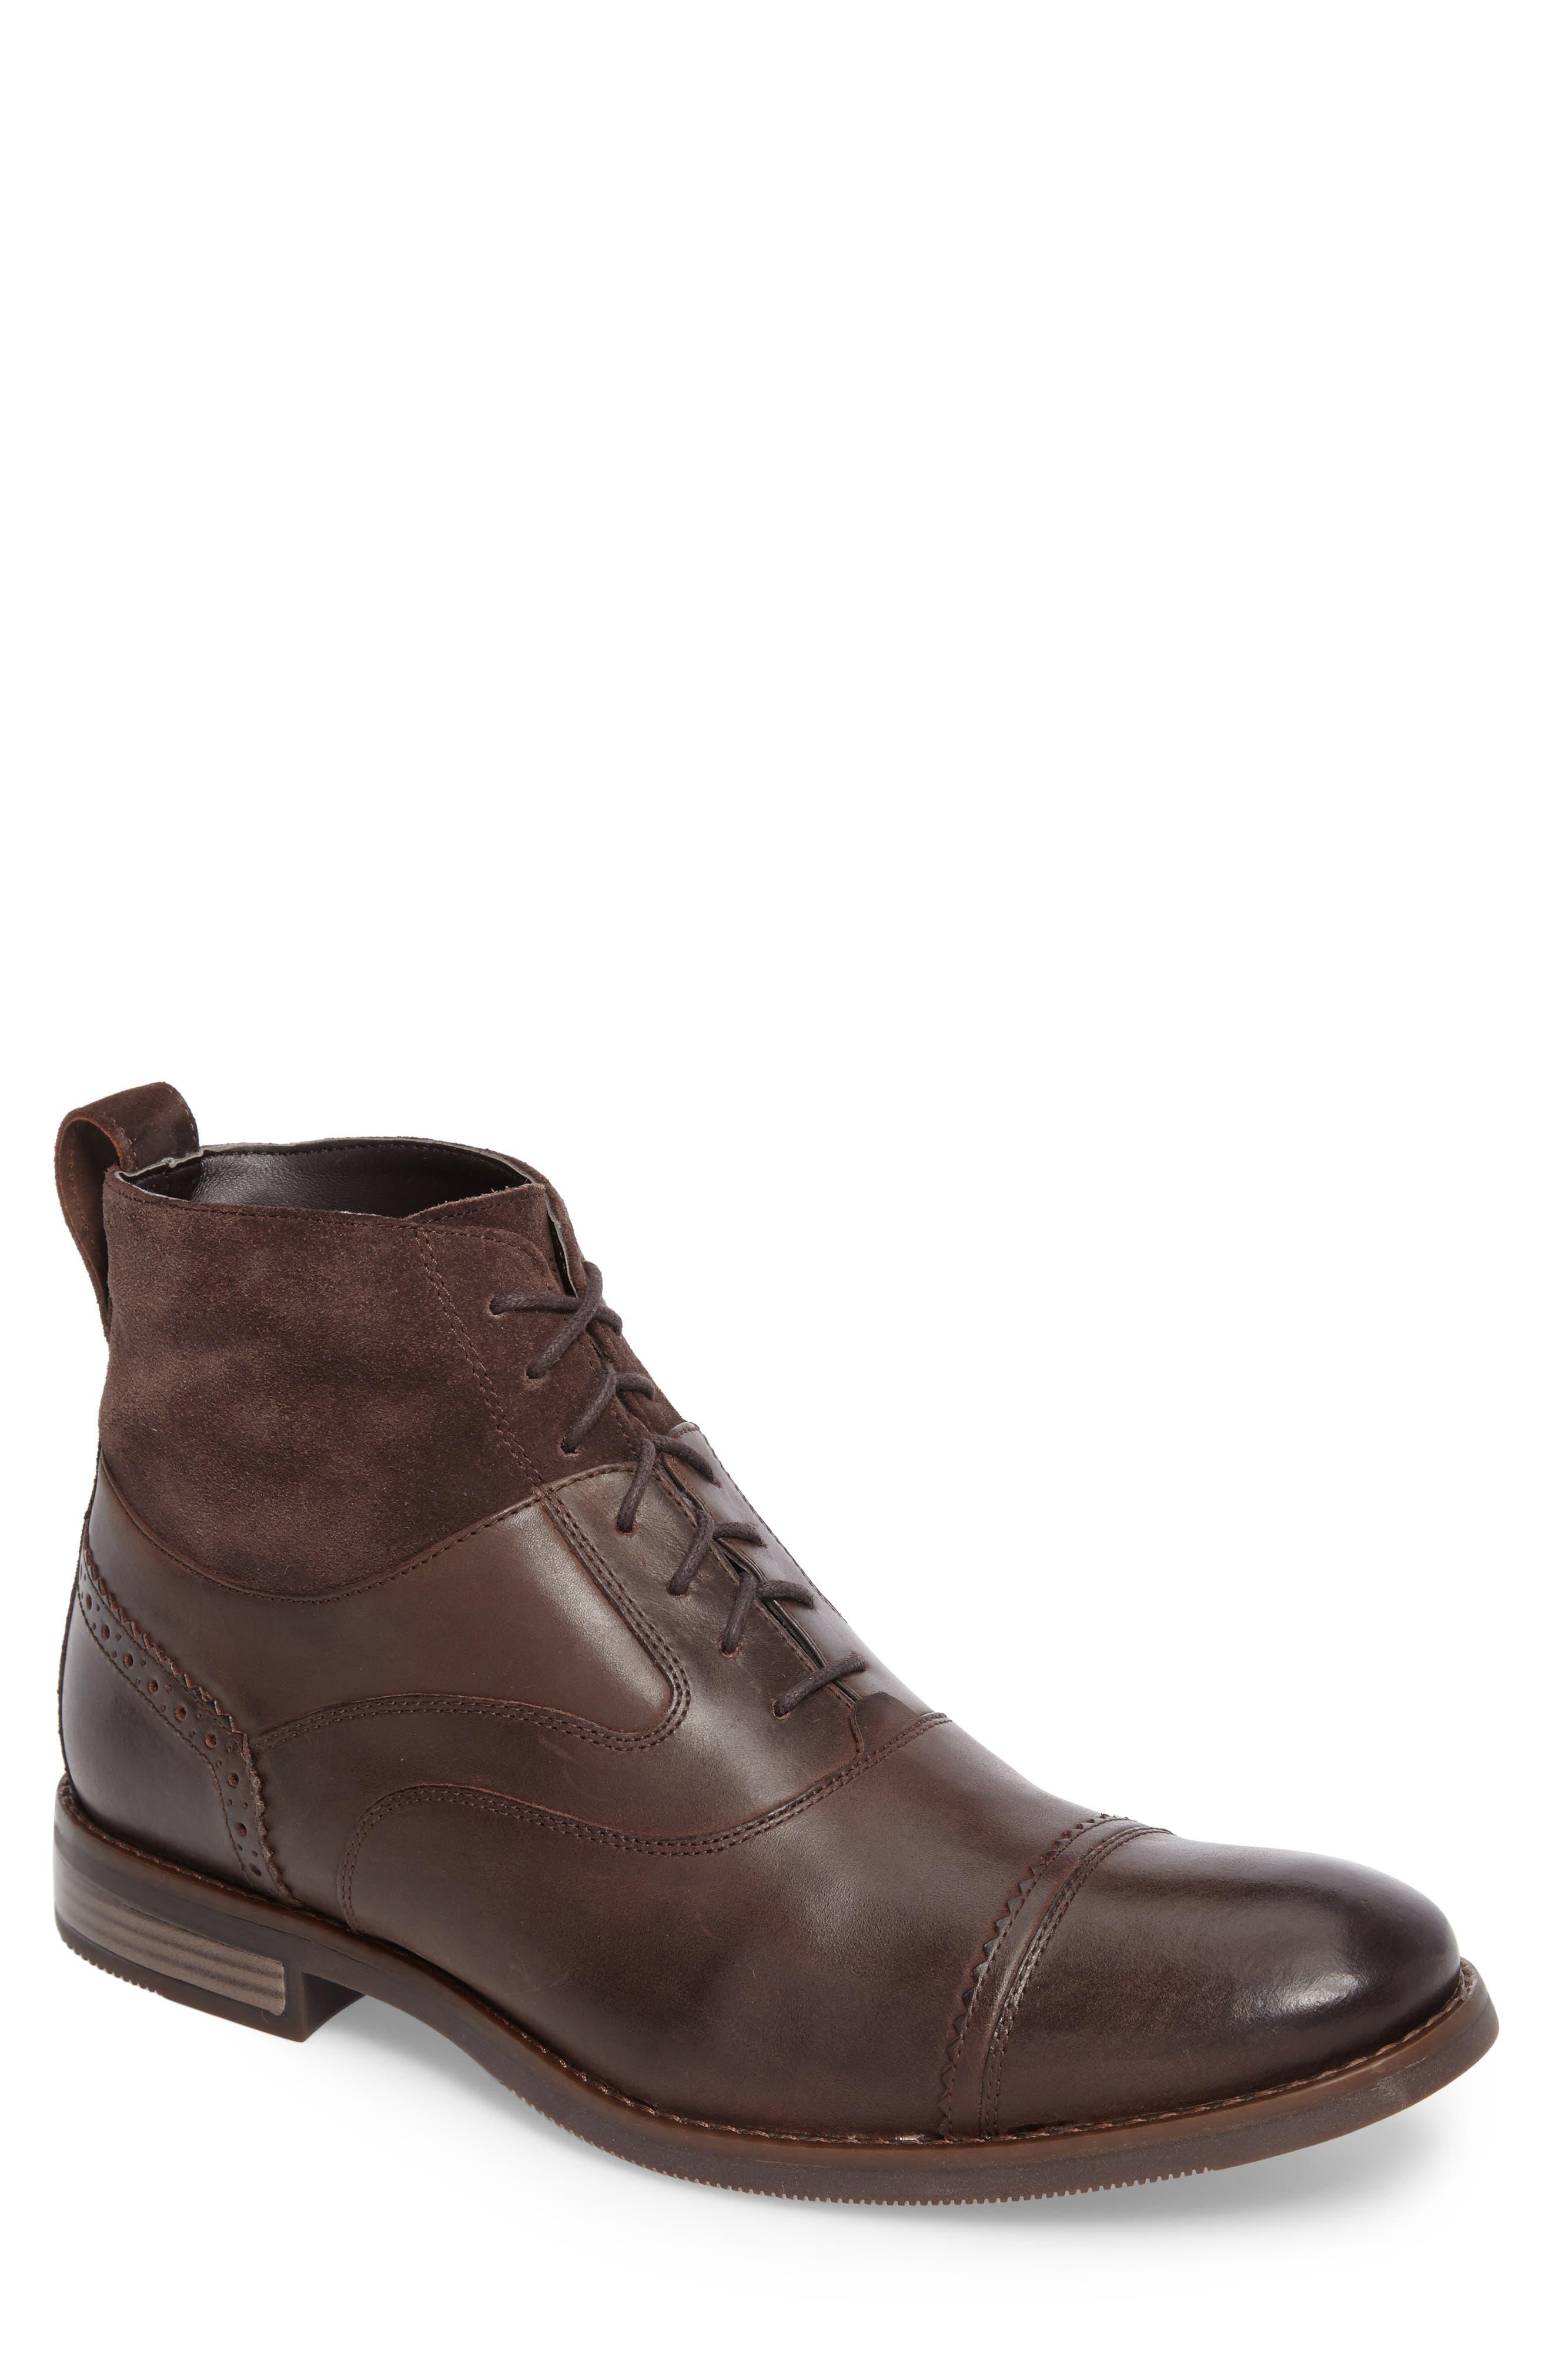 Wynstin Cap Toe Boot,                         Main,                         color, 201